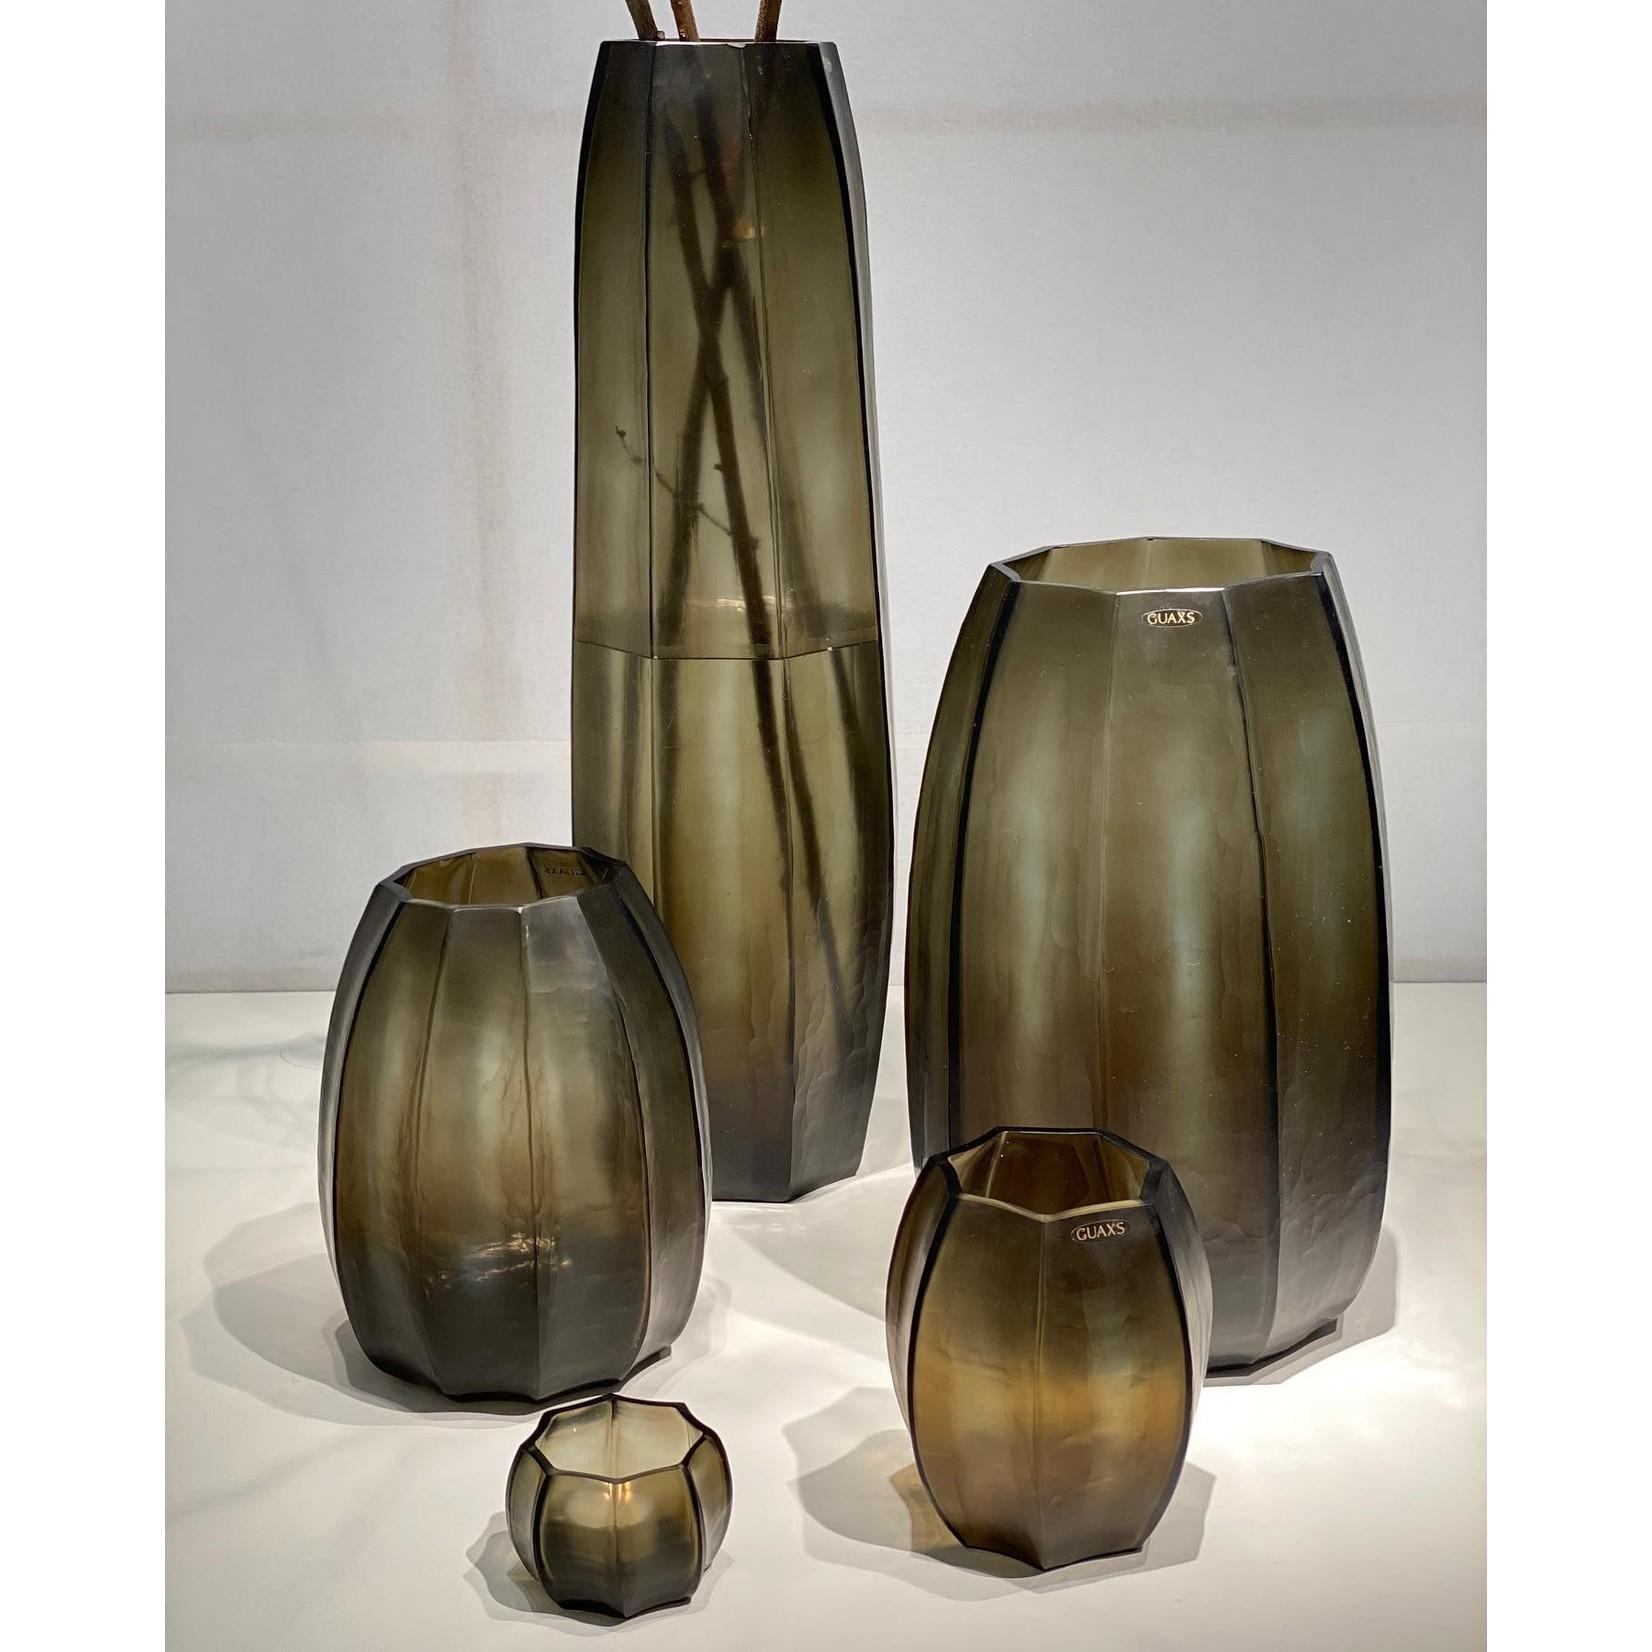 Guaxs Vase Koonam S   Indigo / Smoke Gray